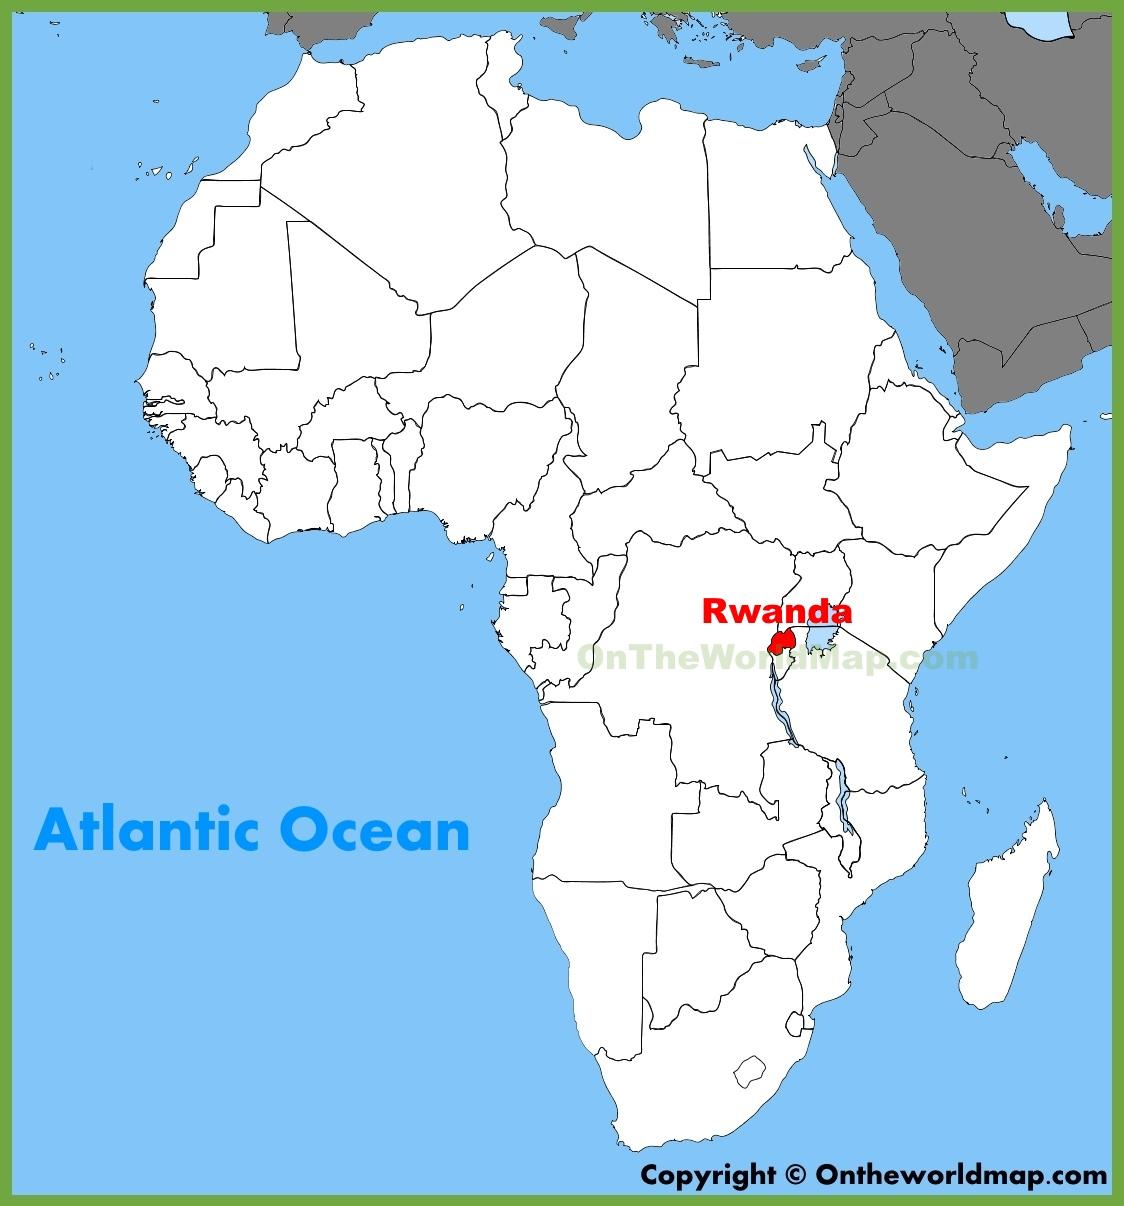 Rwanda On Map Rwanda location on the Africa map